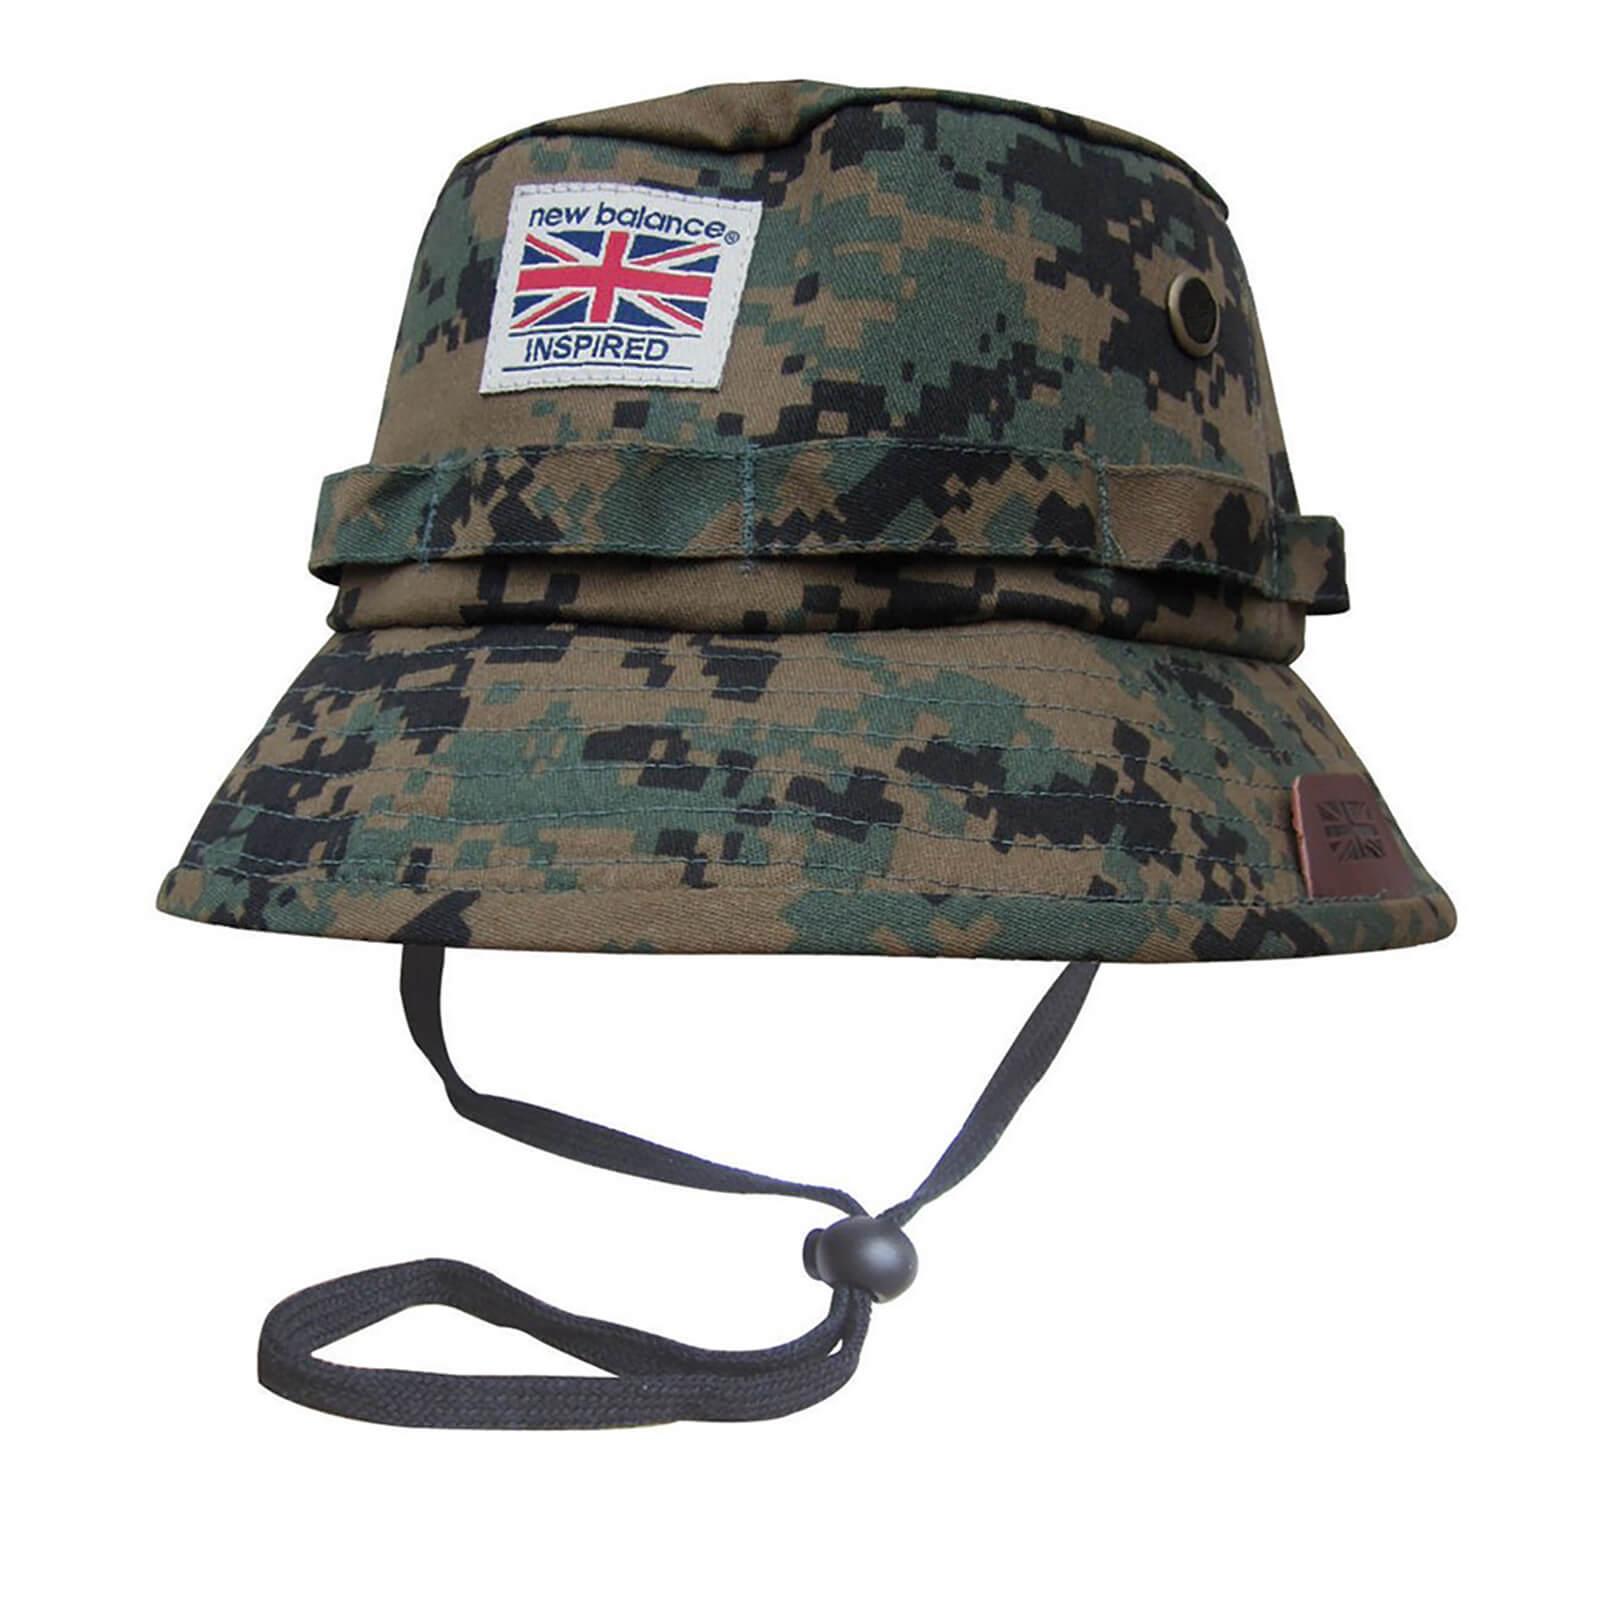 3ae02dca18f New Balance Men s Explorer Bucket Hat - Grey Digital Camo Clothing ...